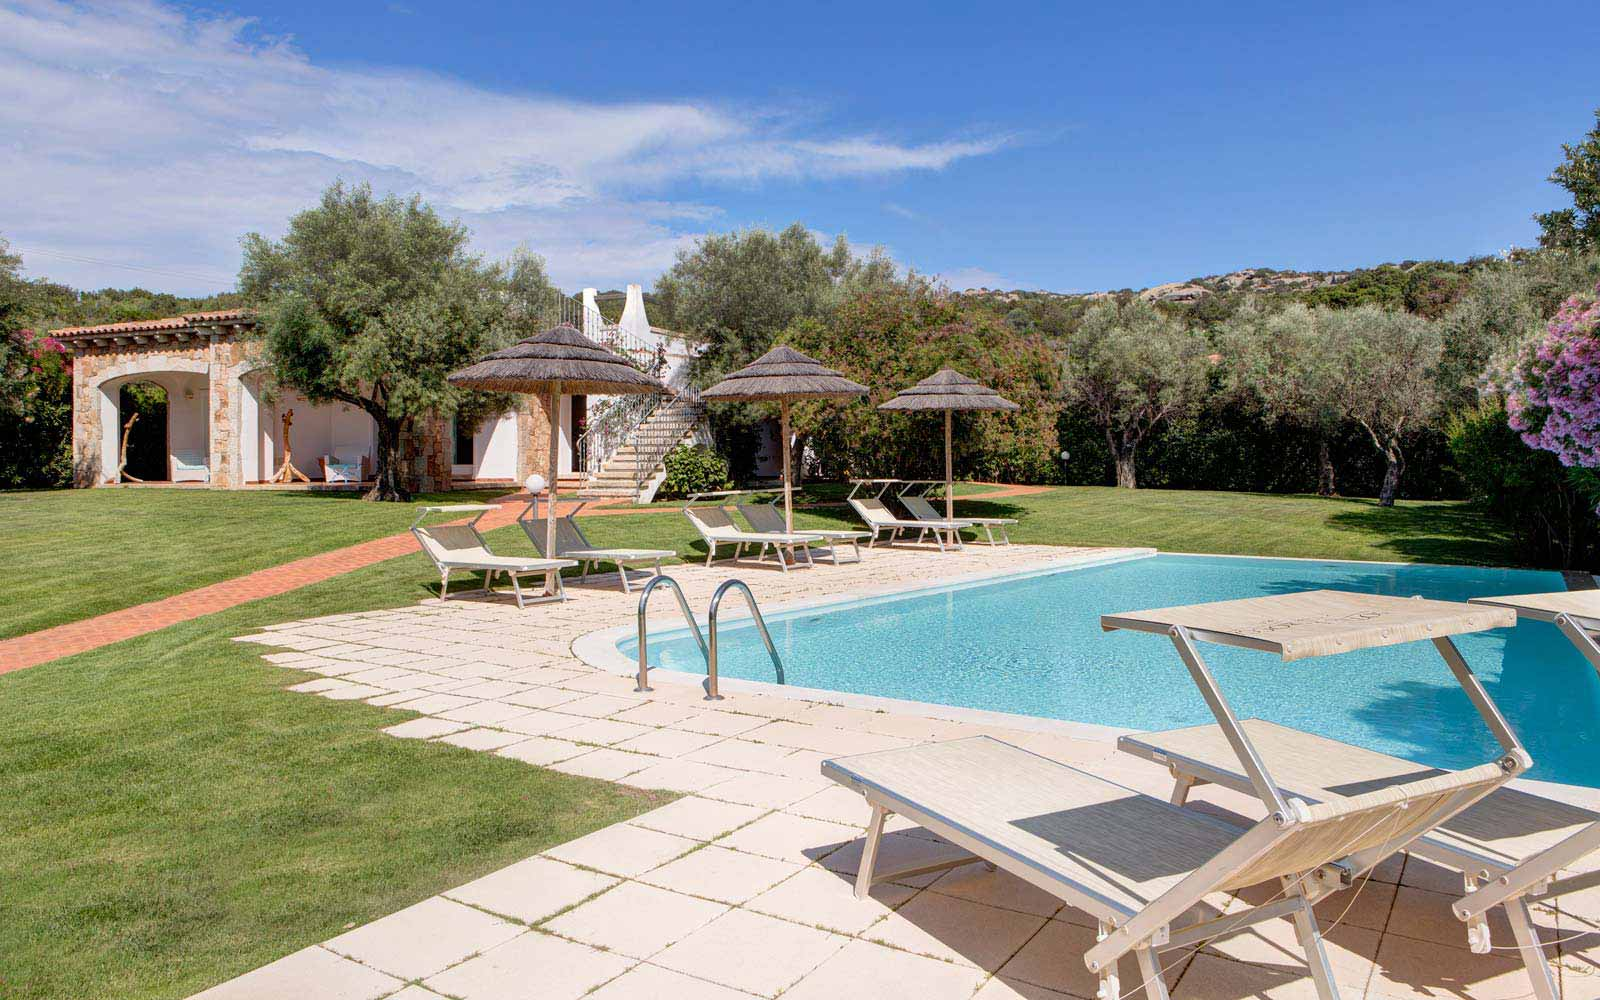 Pool at Hotel La Rocca Resort & Spa